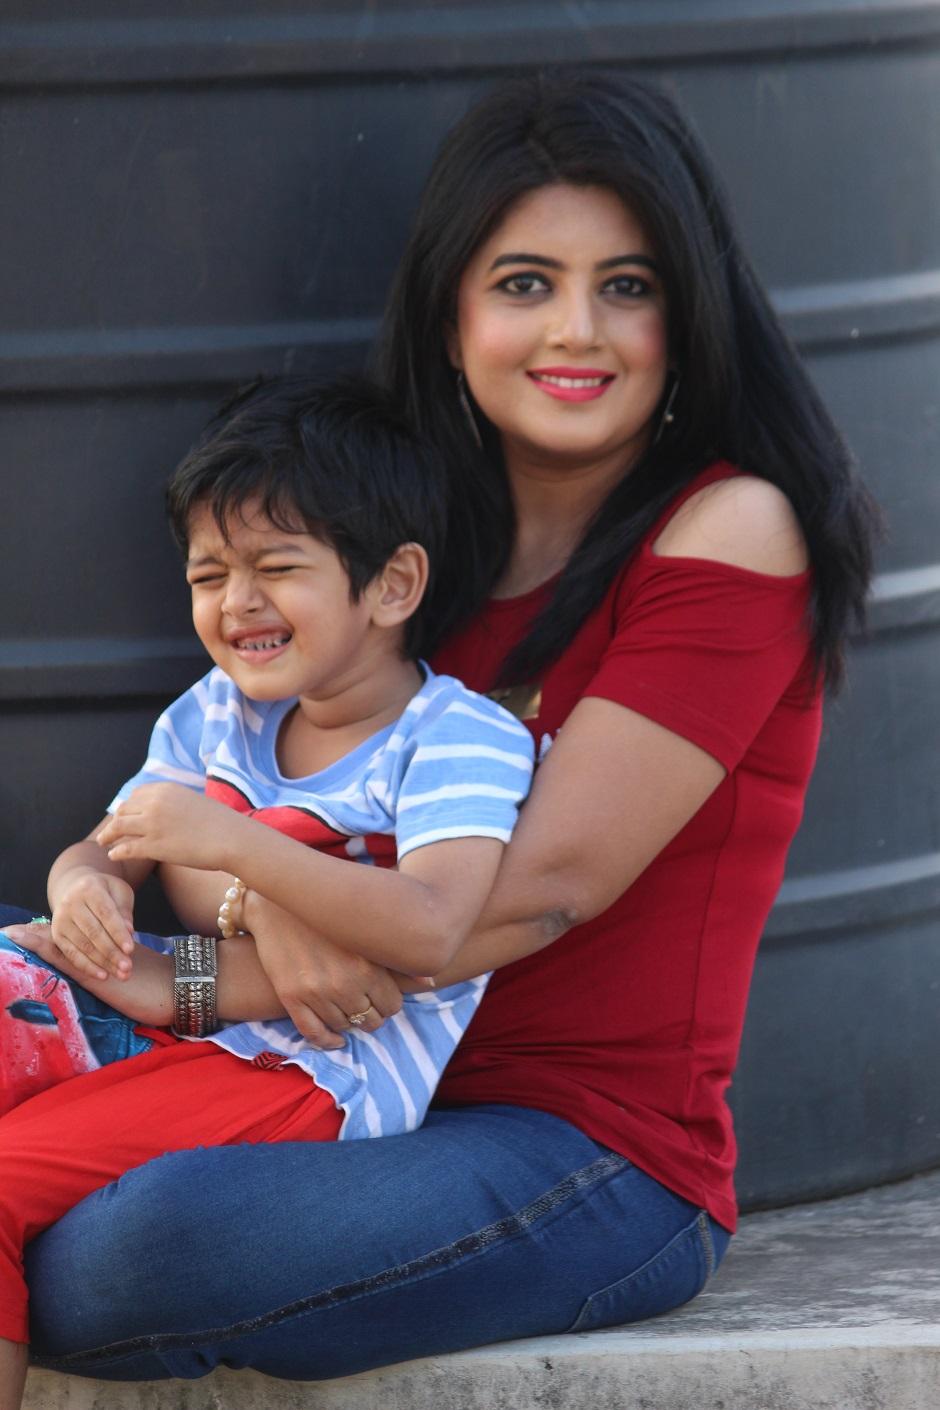 Model: Susmita Sengupta Ghosh